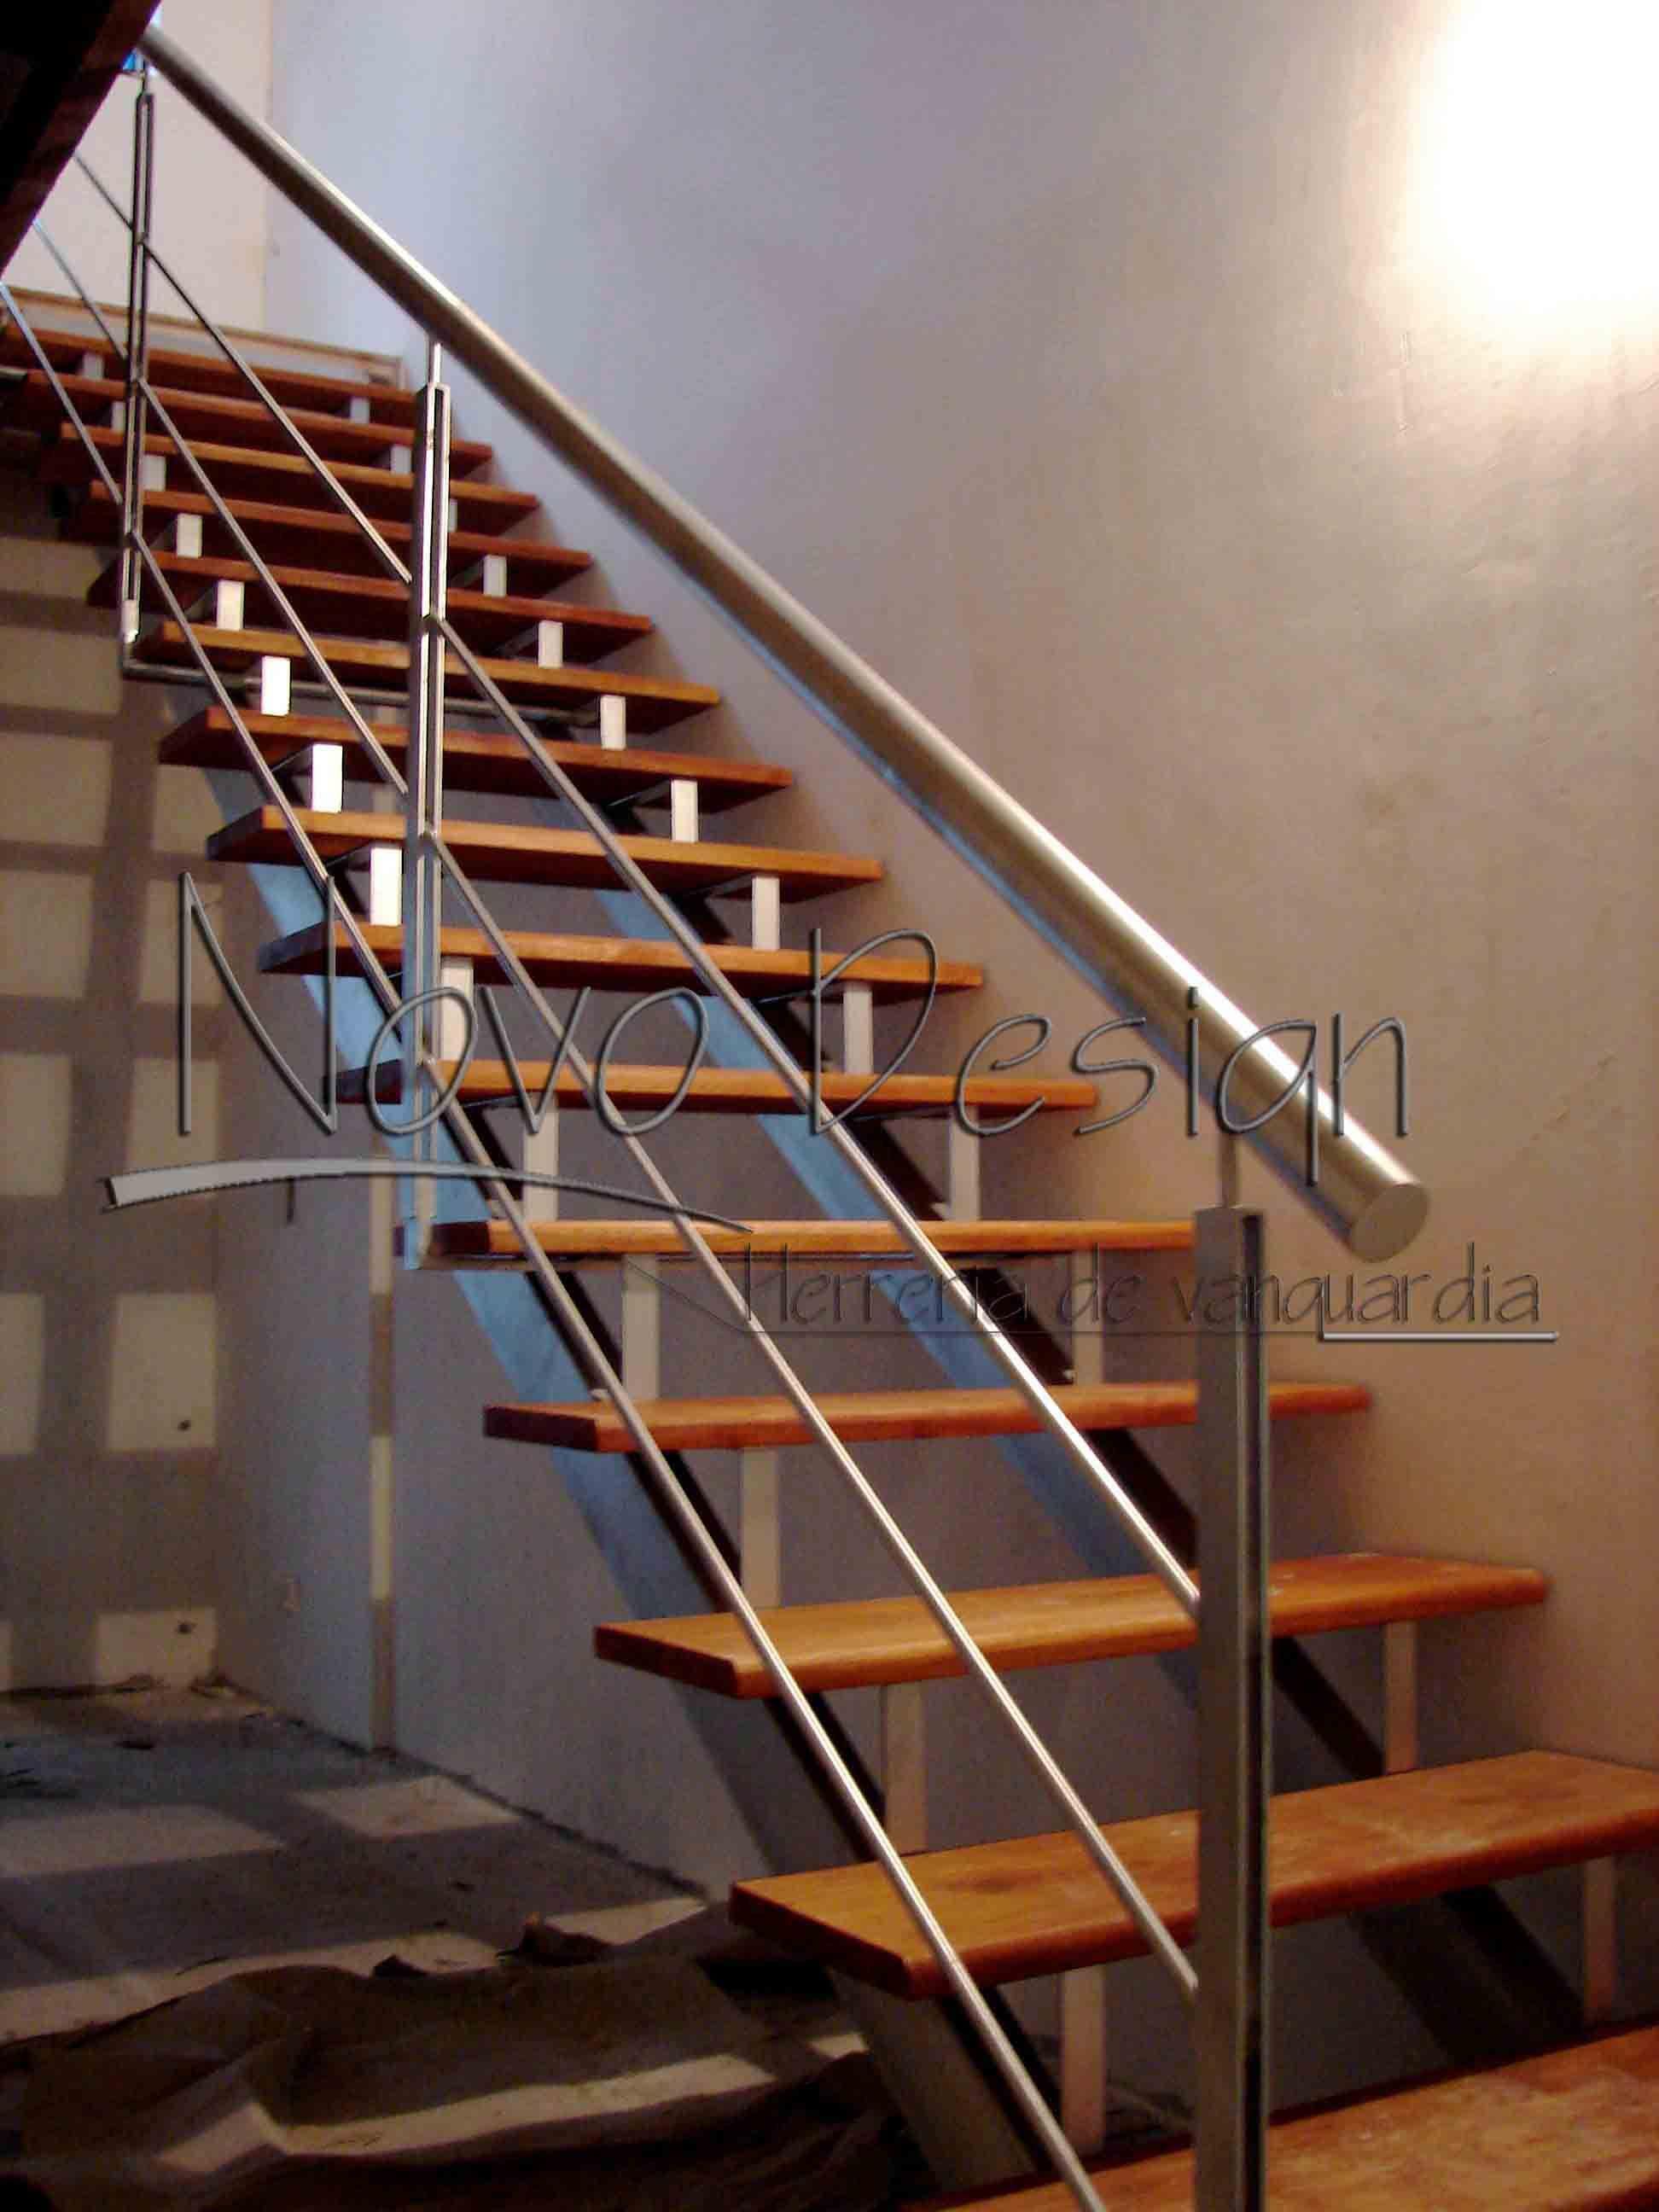 Escalera recta dos ejes venta de escaleras y barandas for Barandas de escalera